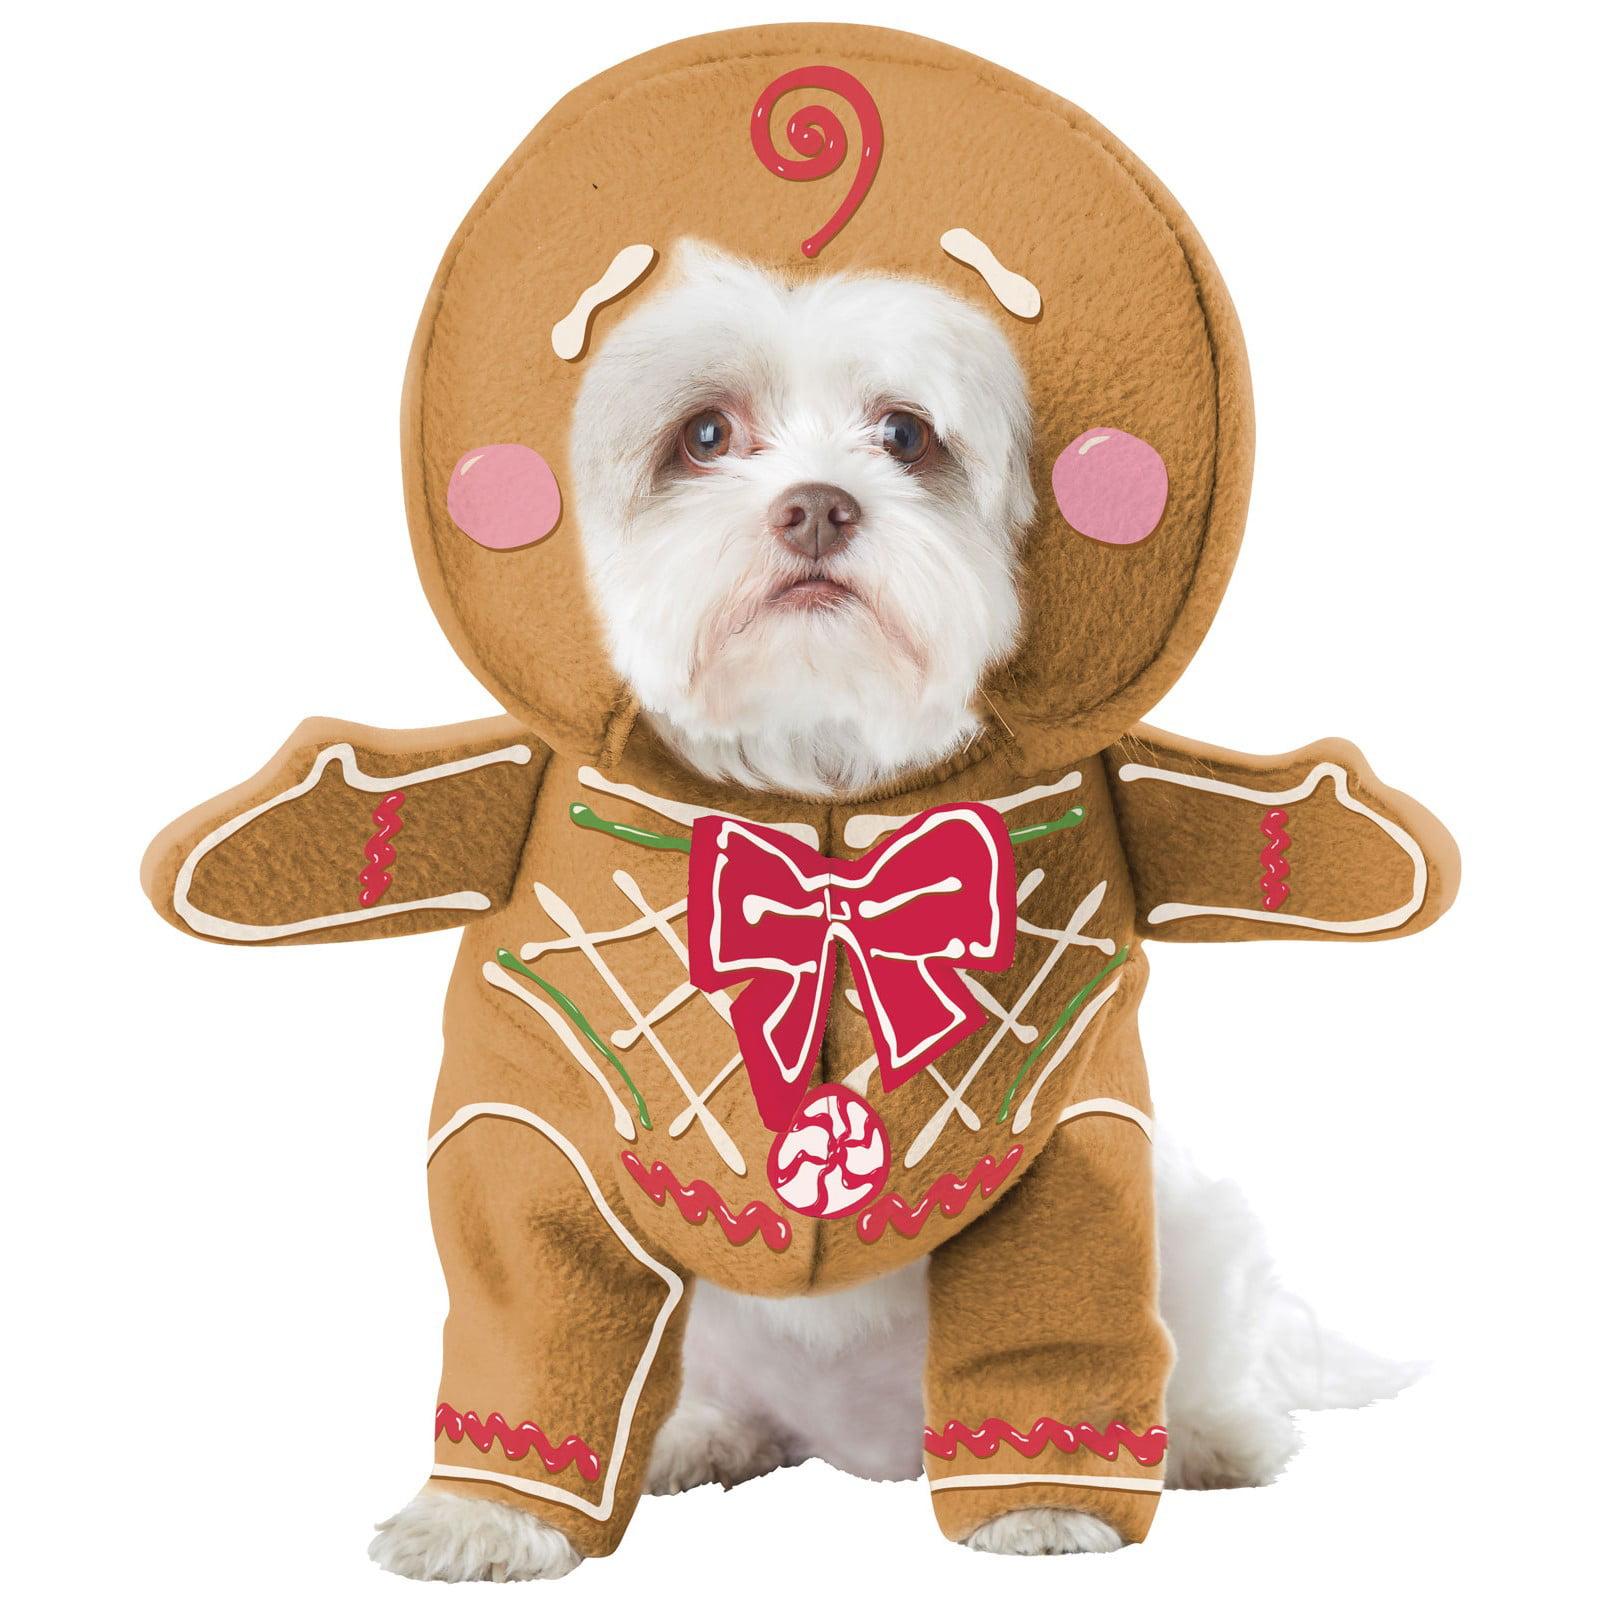 Gingerbread Pup Pet Costume